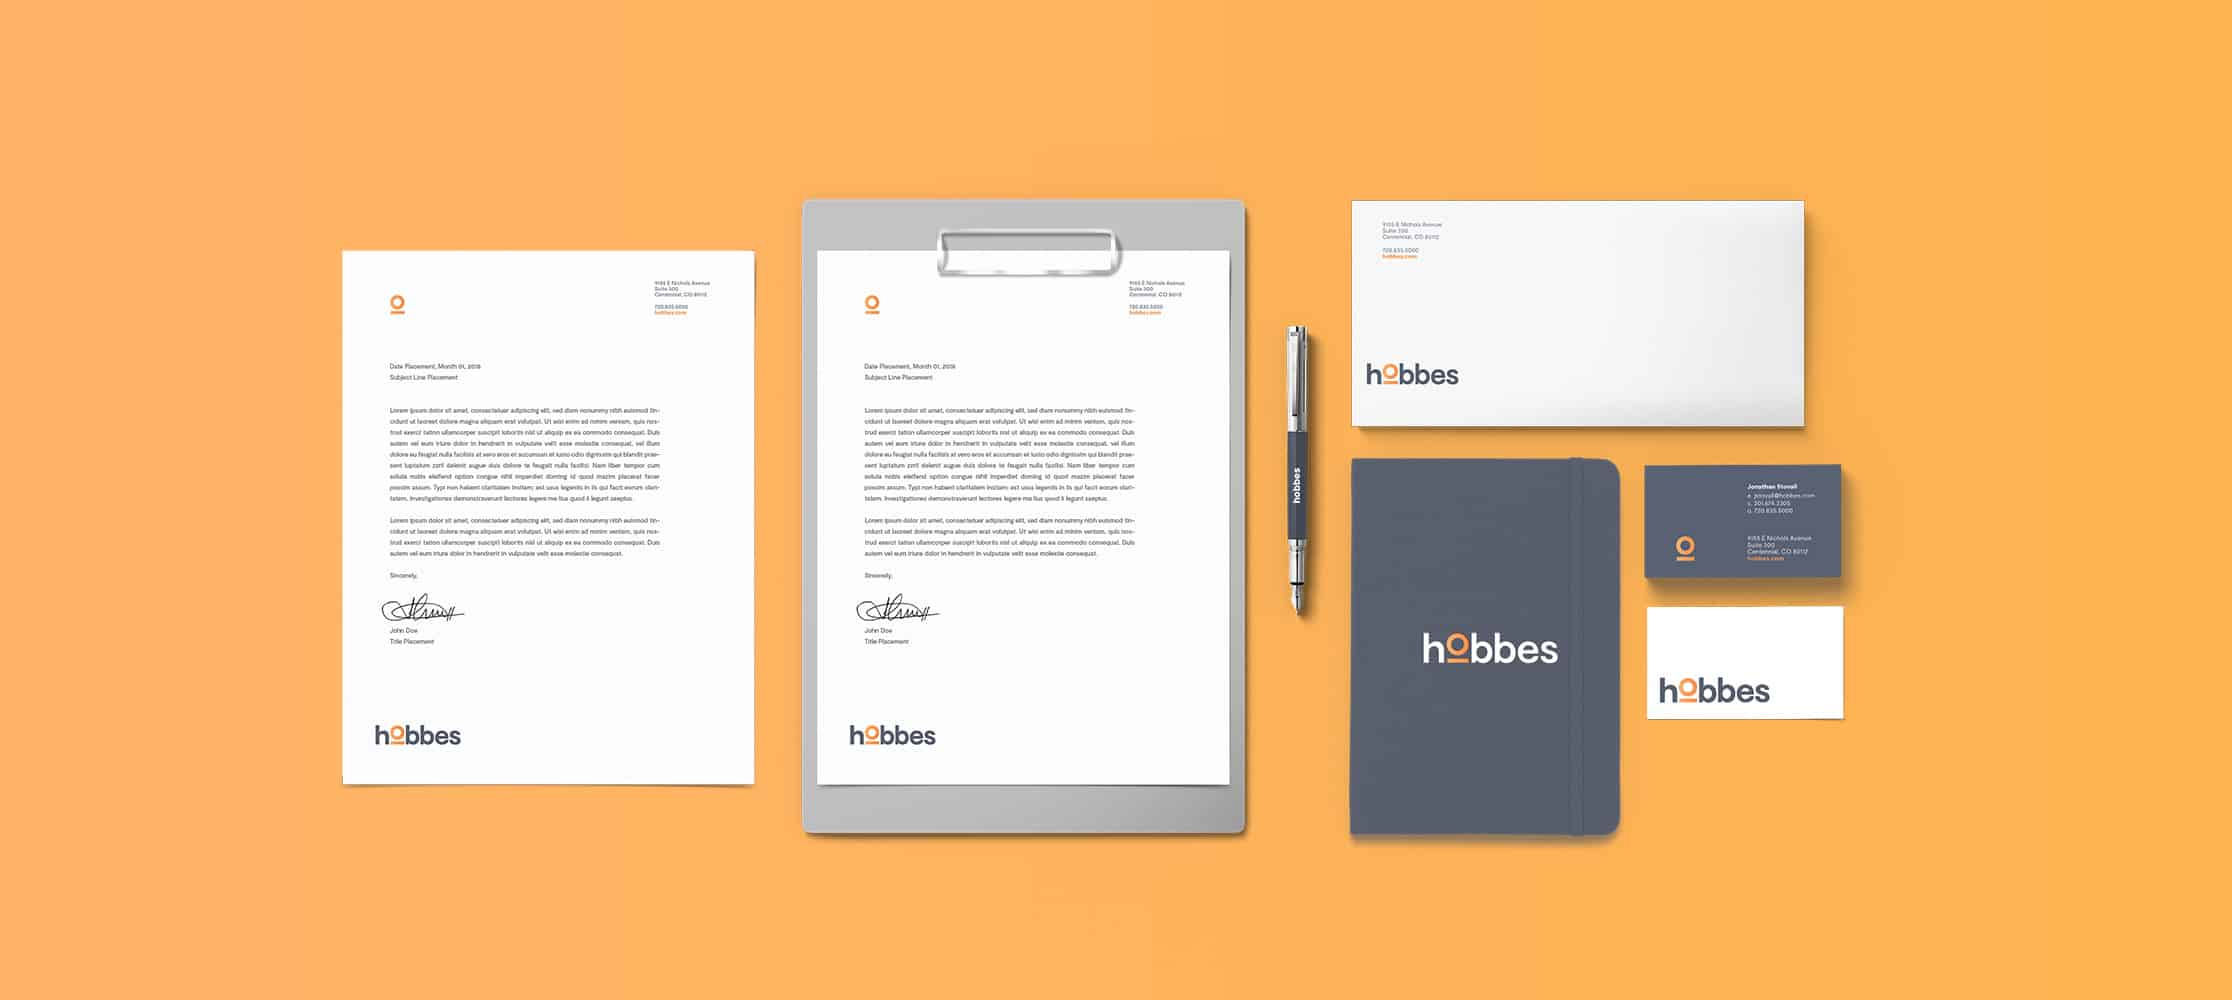 hobbes-identity-fullwidth